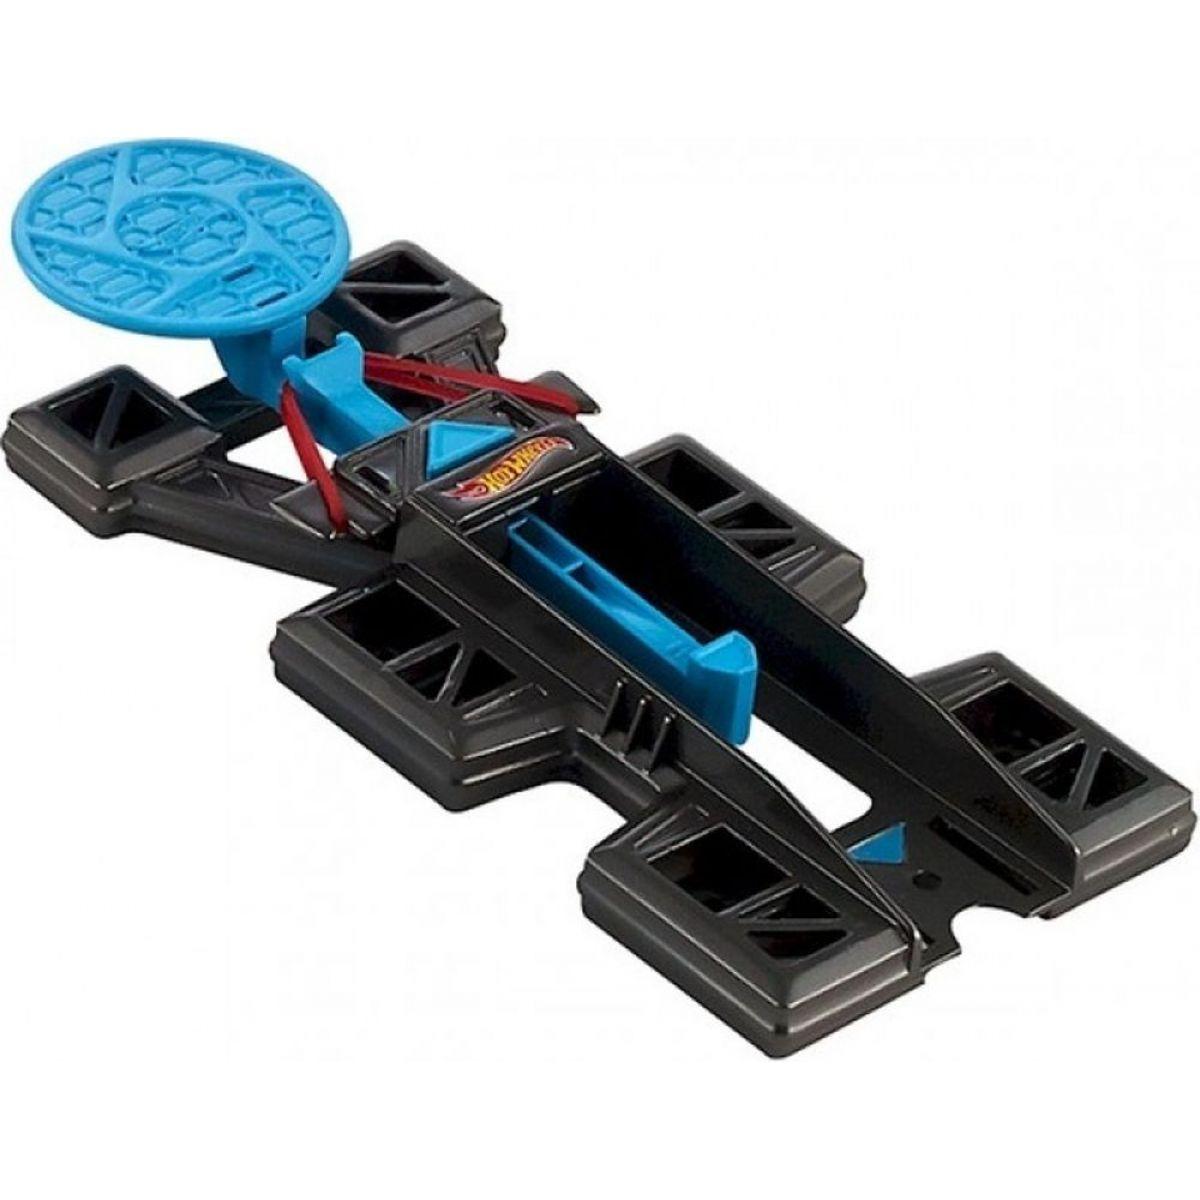 Hot Wheels Track builder set doplňků - Launch it!